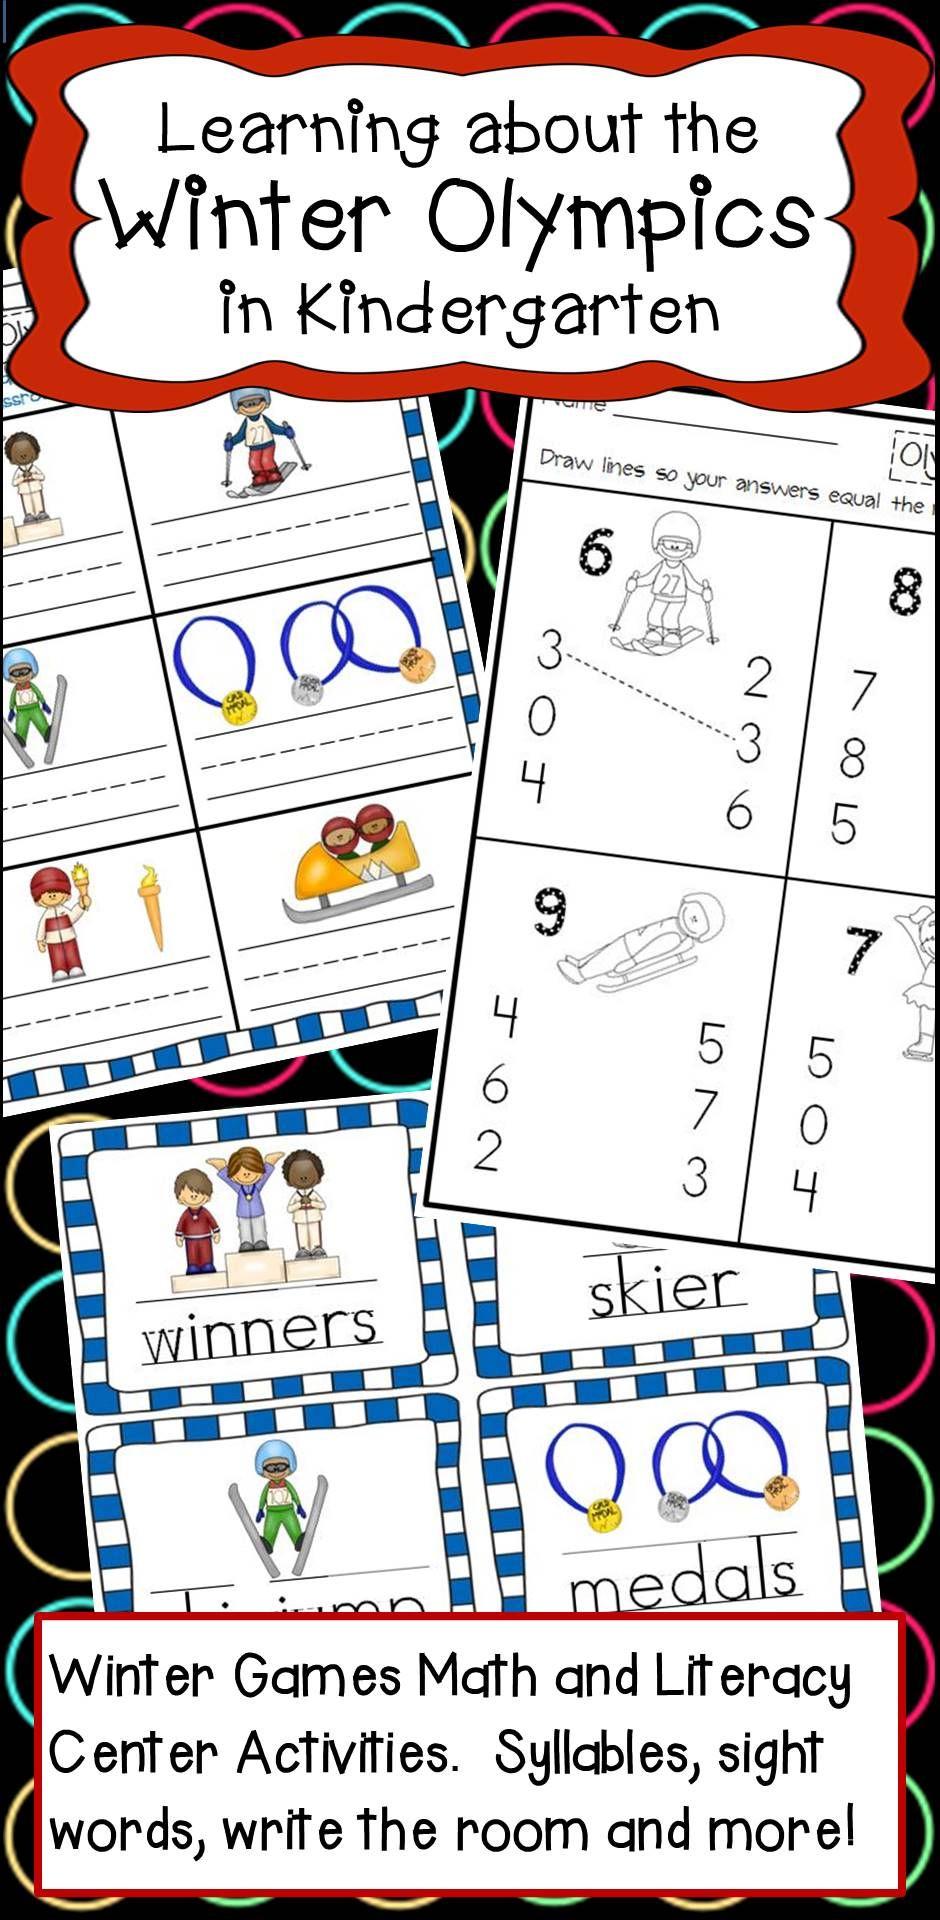 Kindergarten Winter Olympics Literacy And Math Activities Kindergarten Math Activities Winter Kindergarten Winter Olympics [ 1920 x 940 Pixel ]